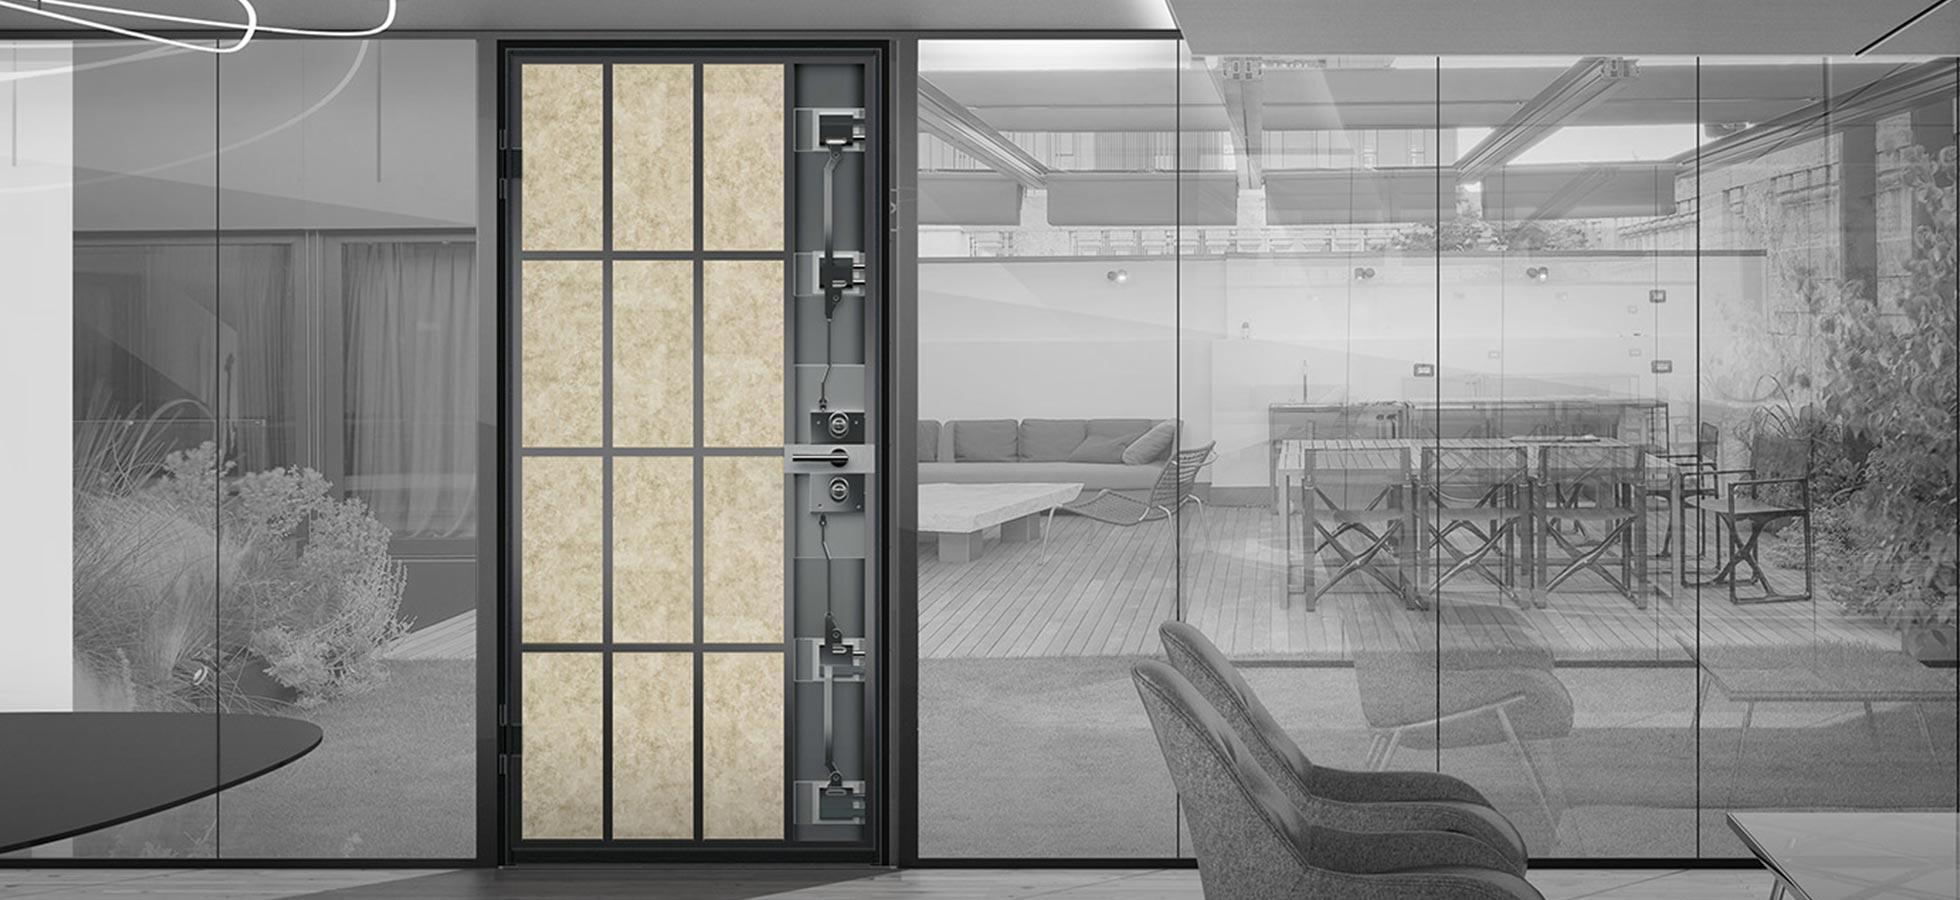 Porta blindata prezzo: quanto costa una porta blindata? 1